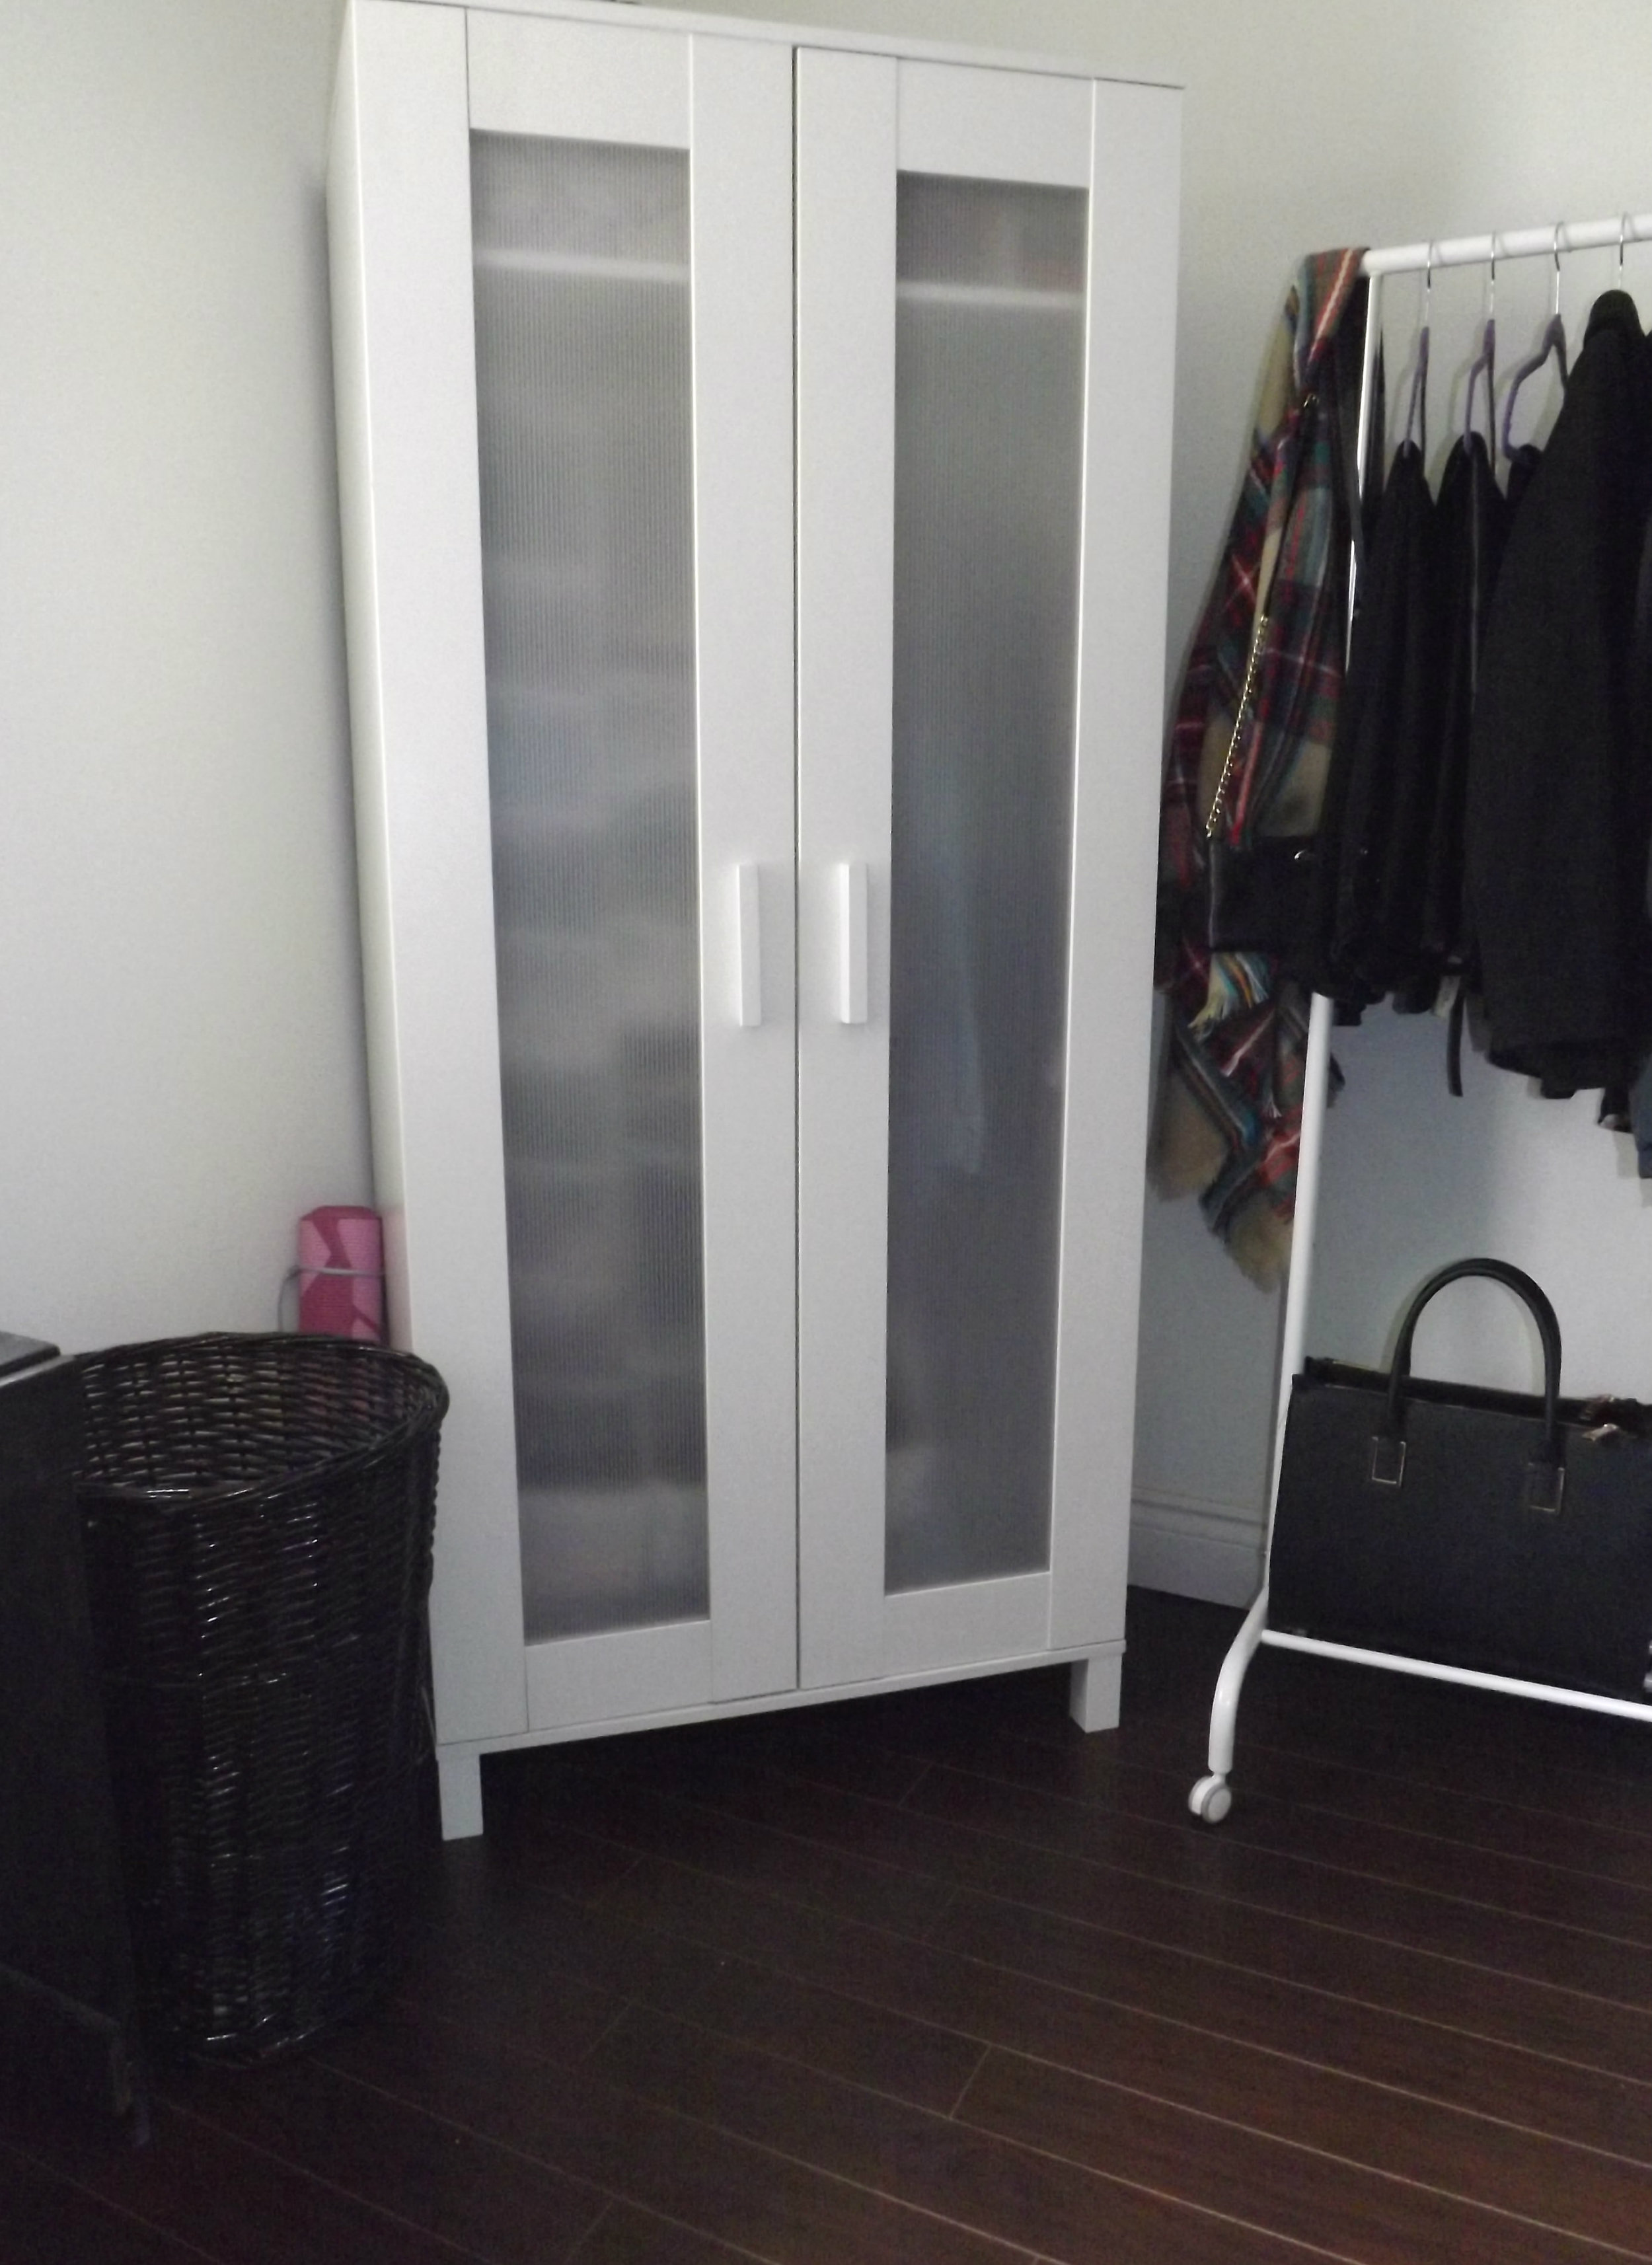 Wardrobe | Tall Girl Meets World